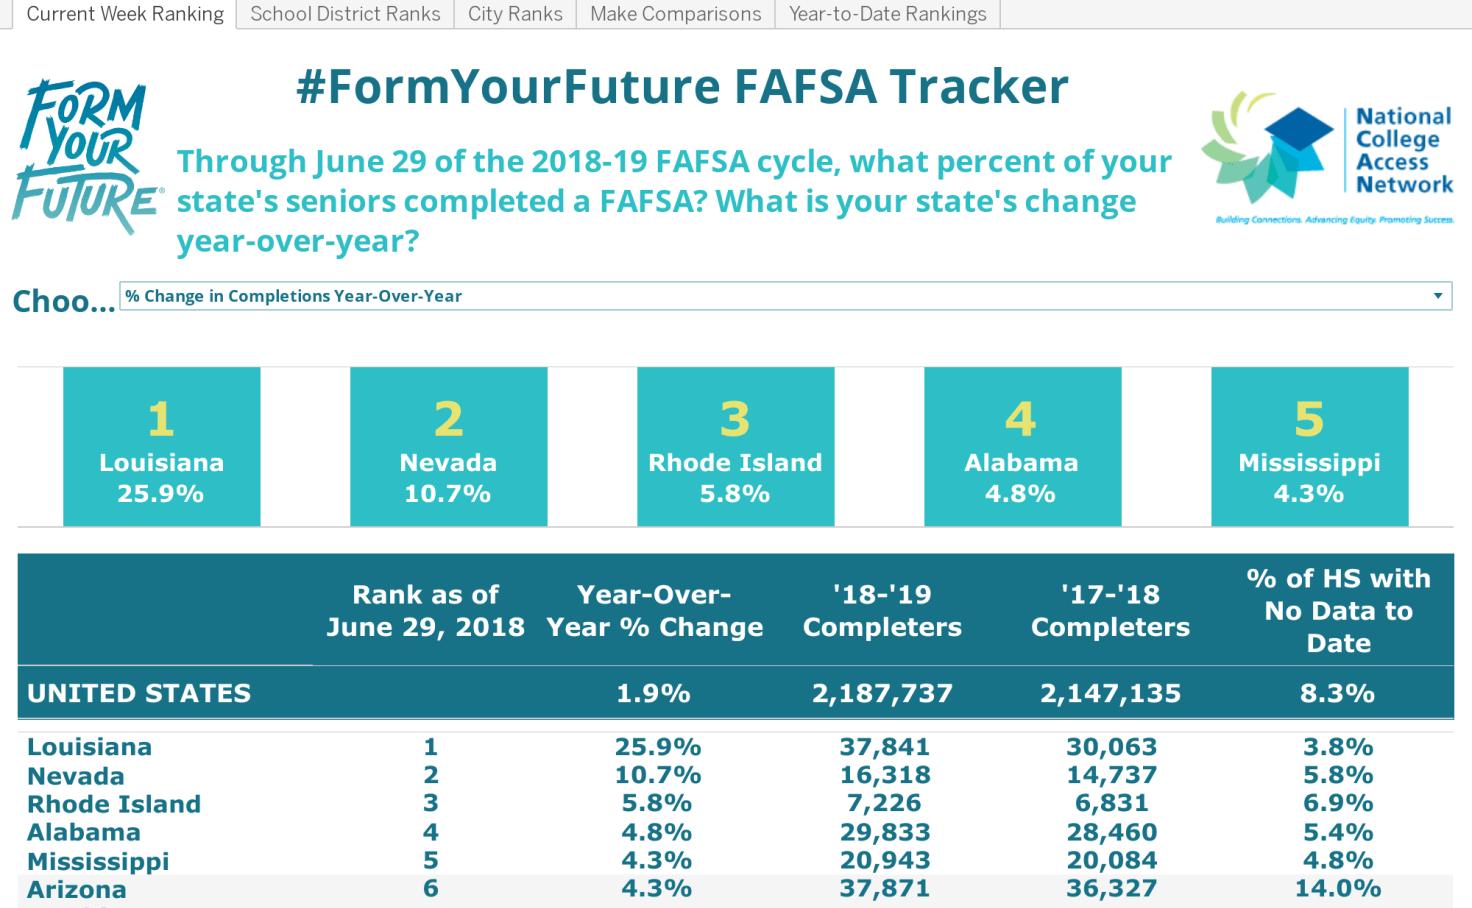 Form Your Future Fafsa Tracker